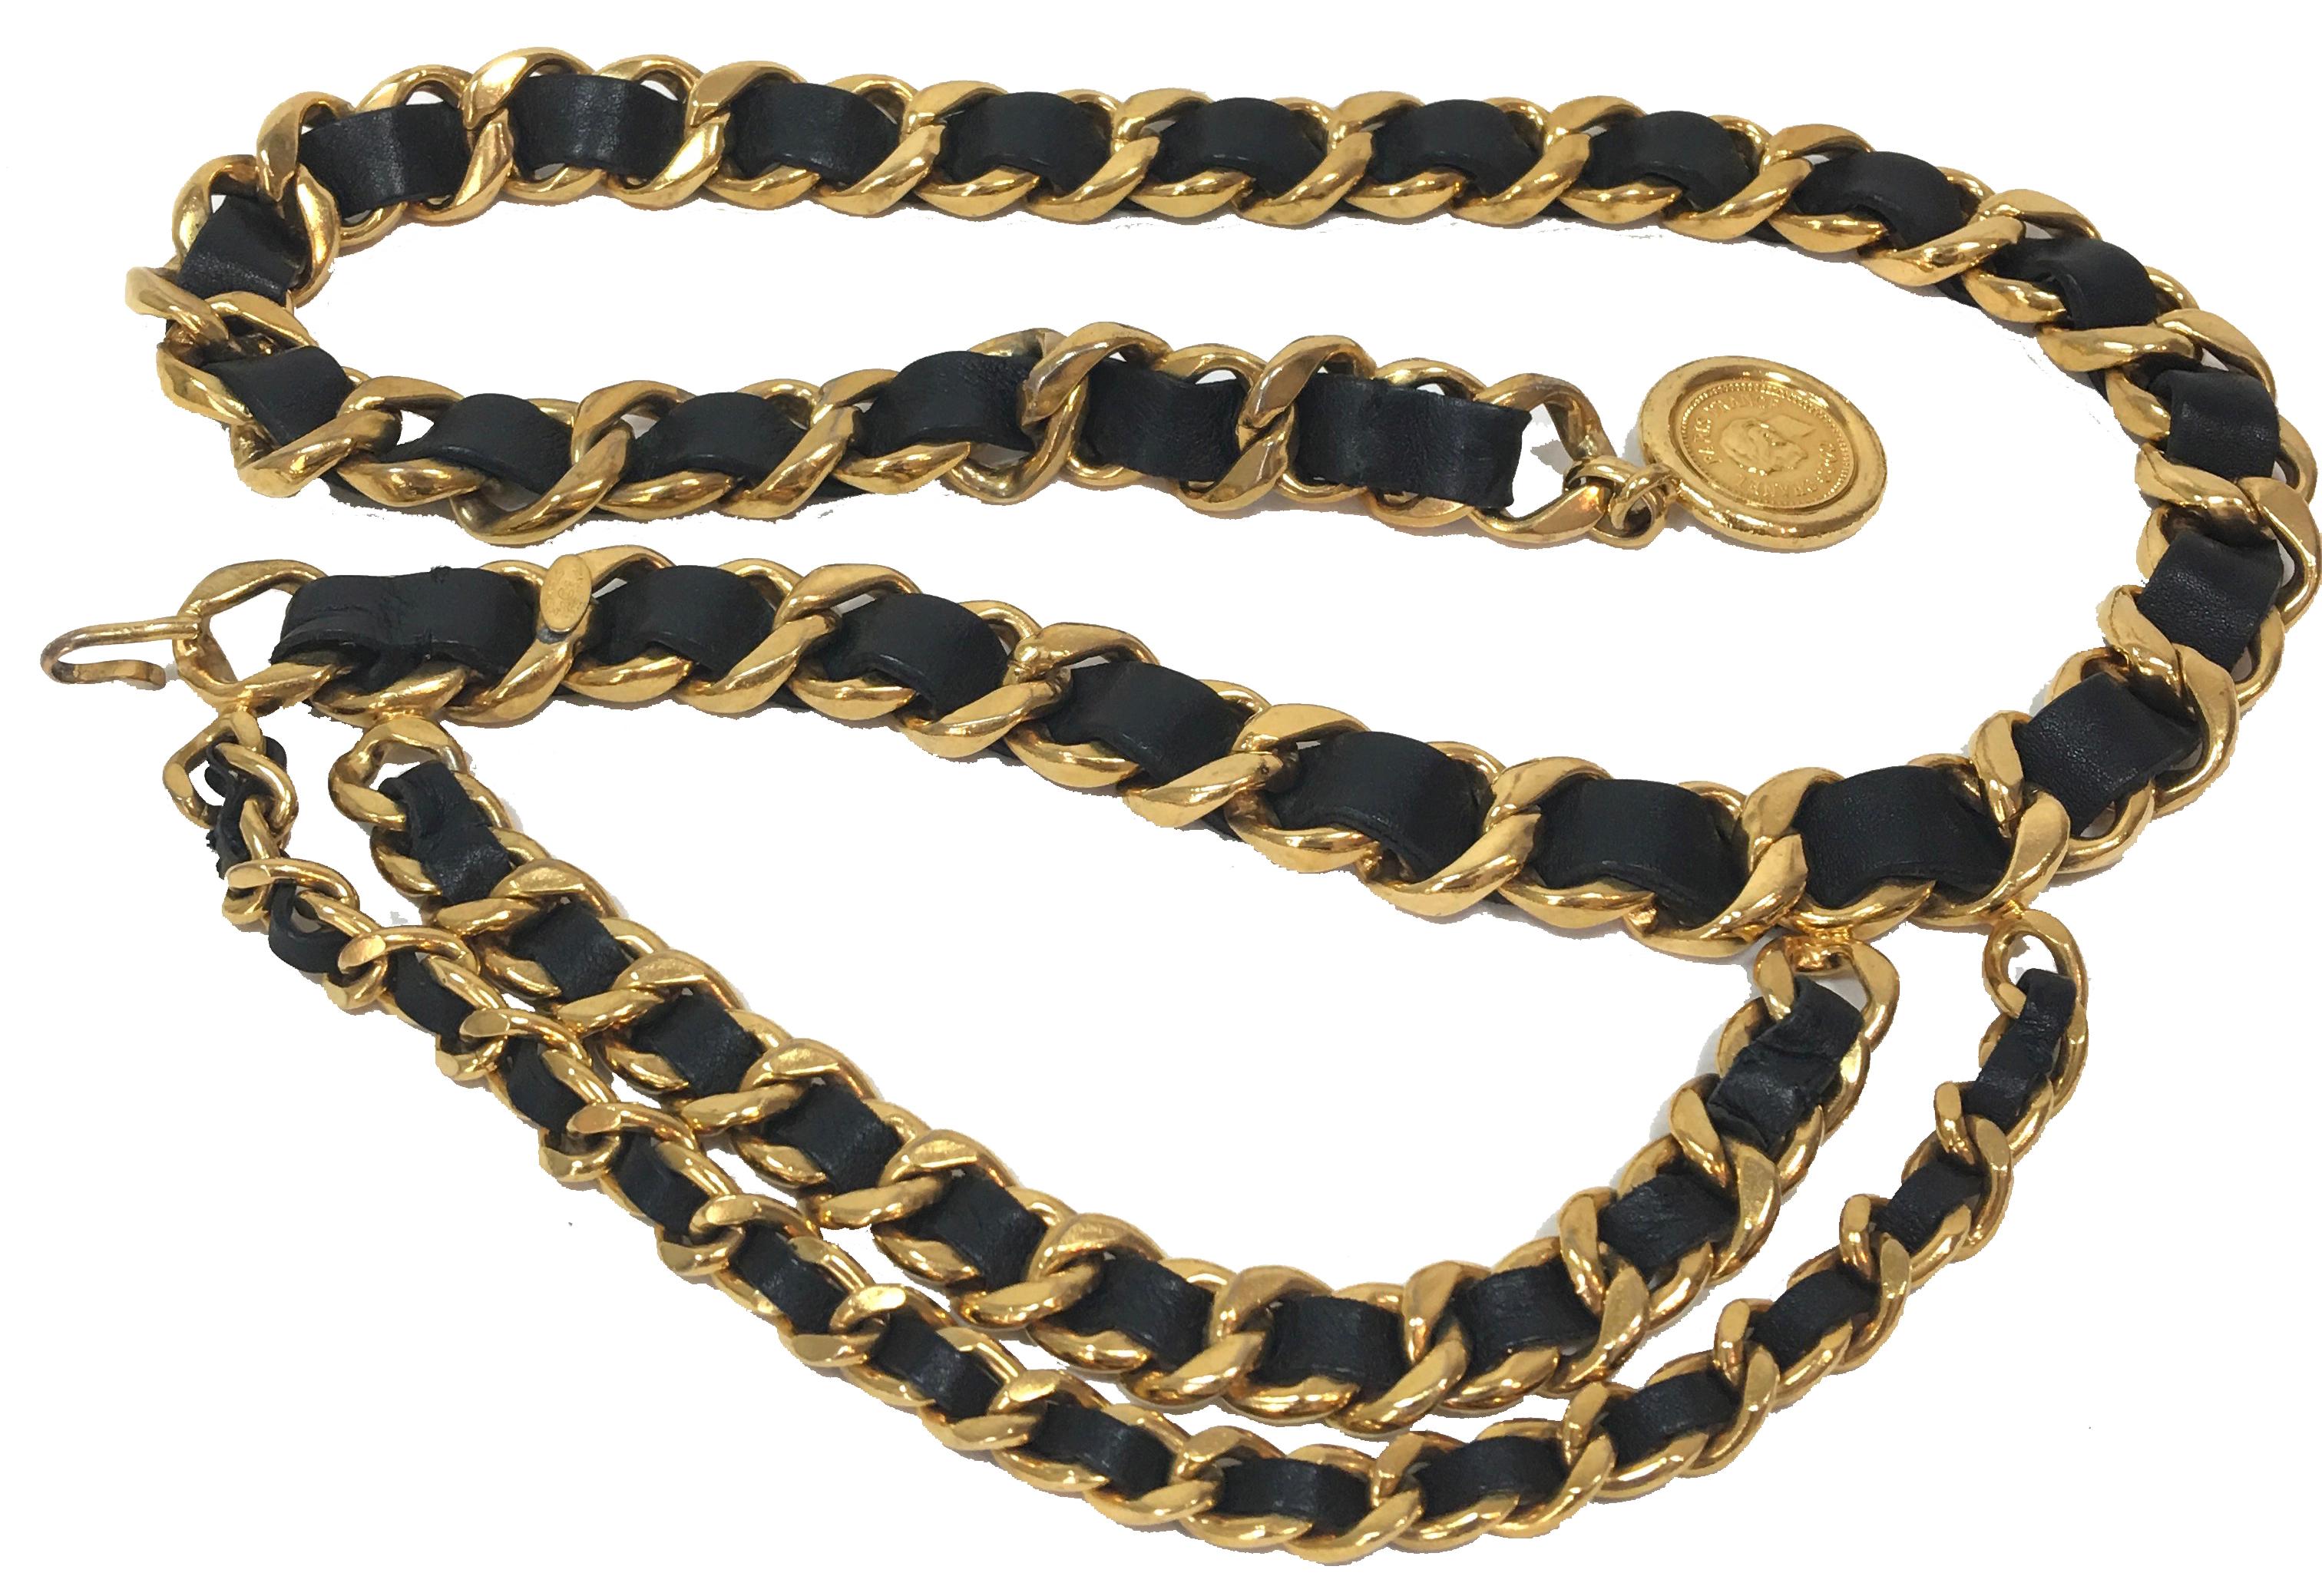 Chanel-belt-gold-chain-black-leather copie